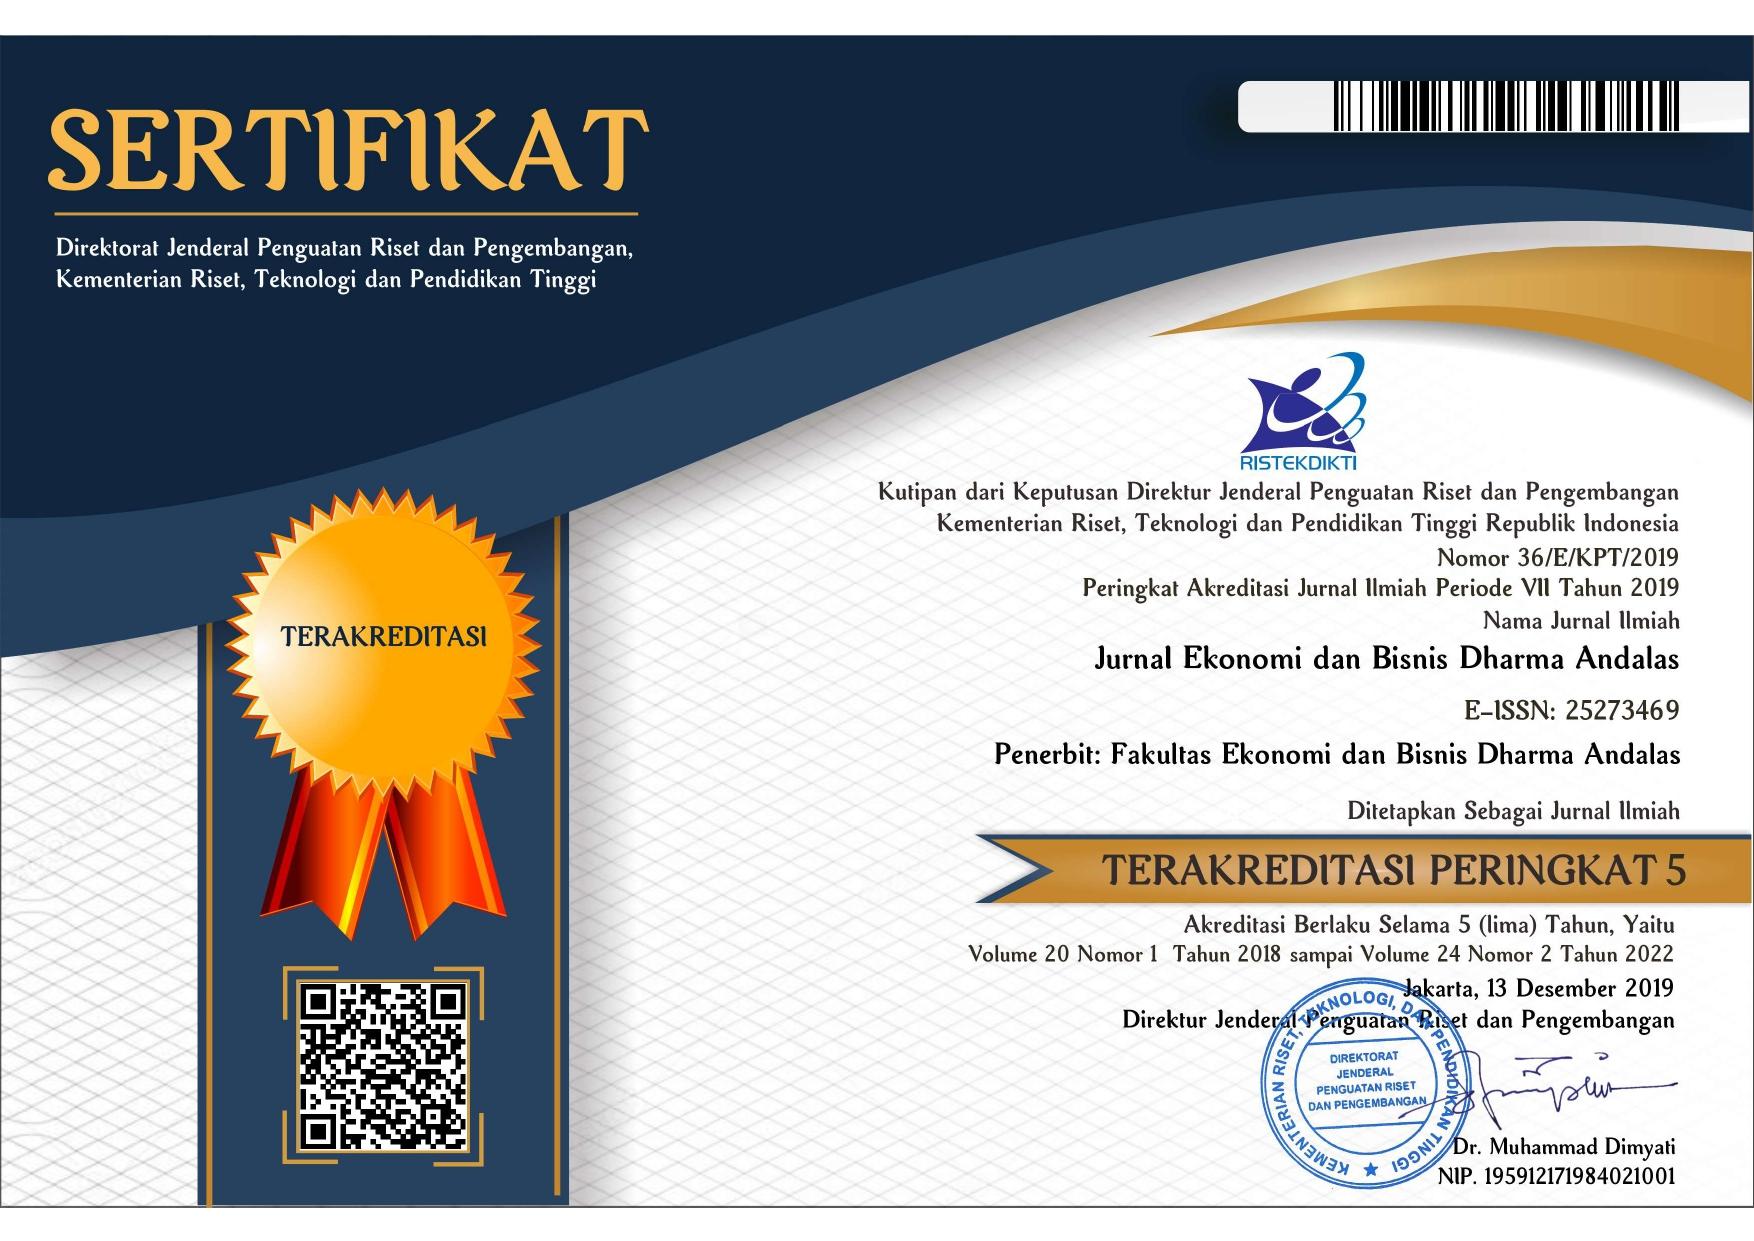 Sertifikat-sinta-5-JEBD-web-page-0001